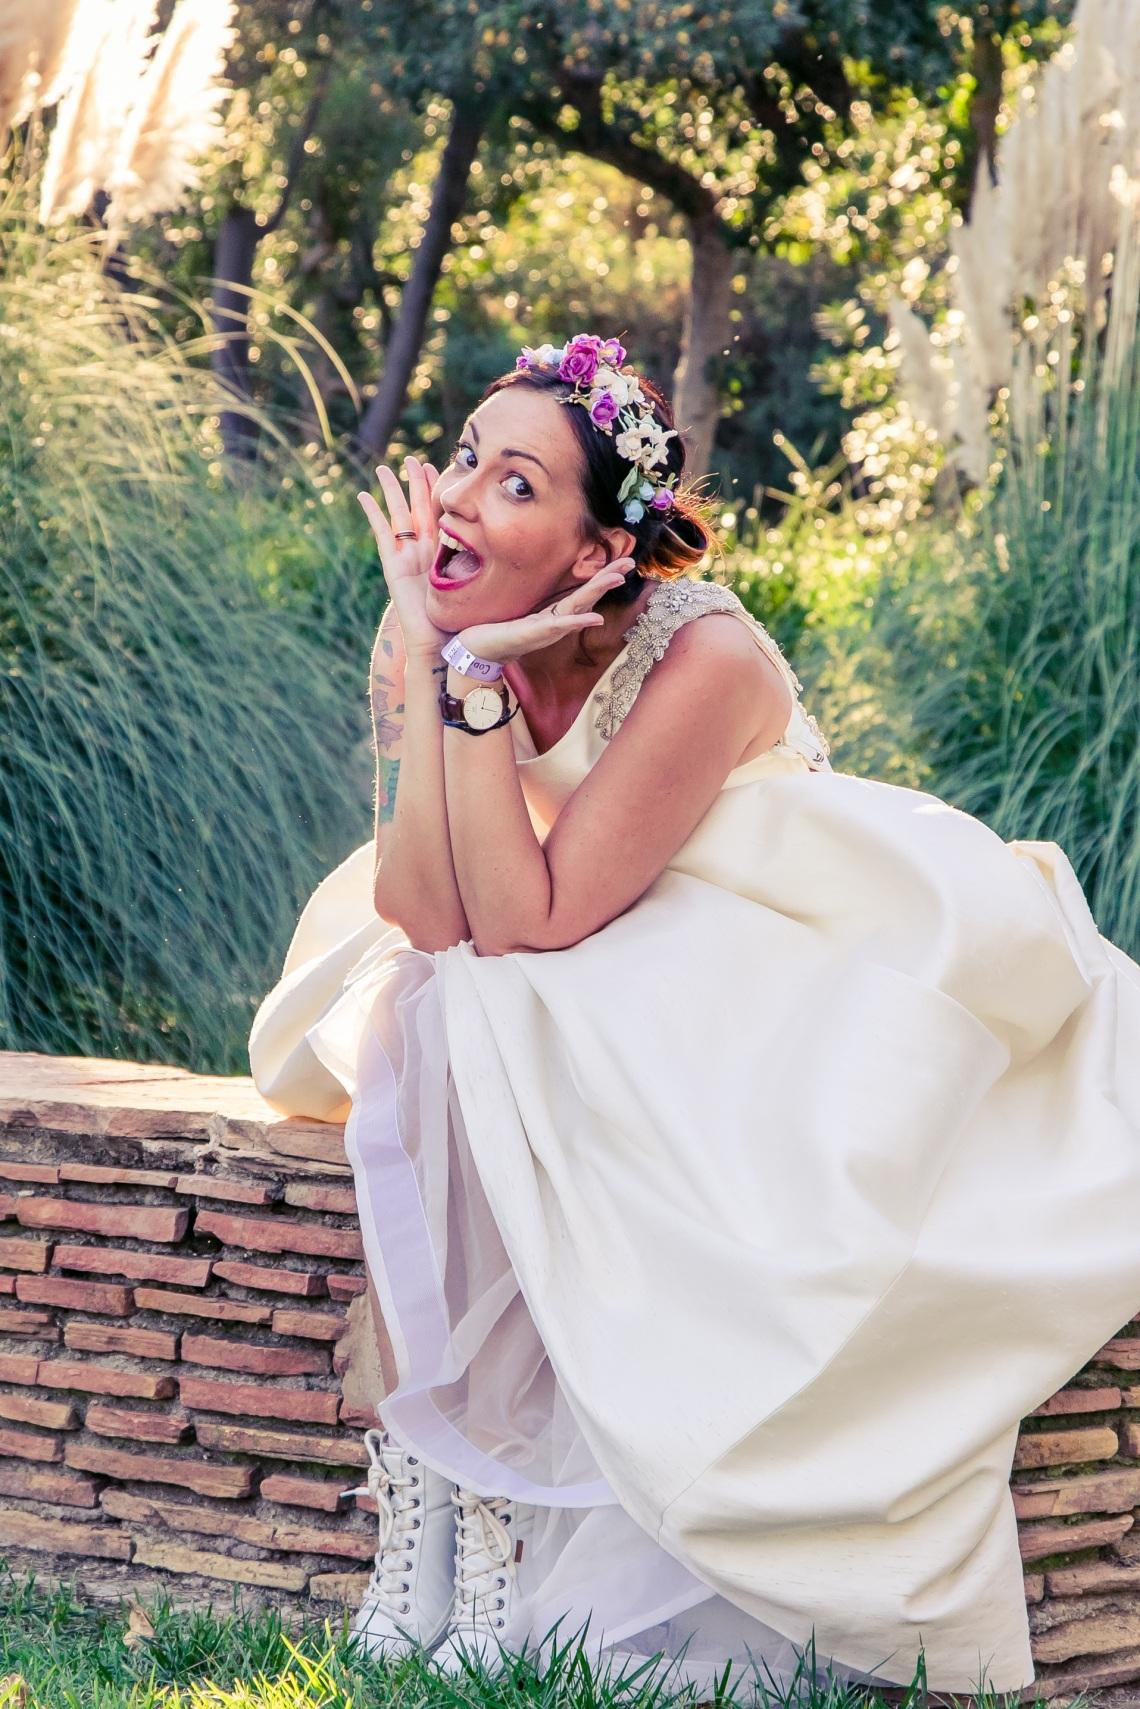 #rosaclaraforbloggers codorniu normcoregirl spanish blogger